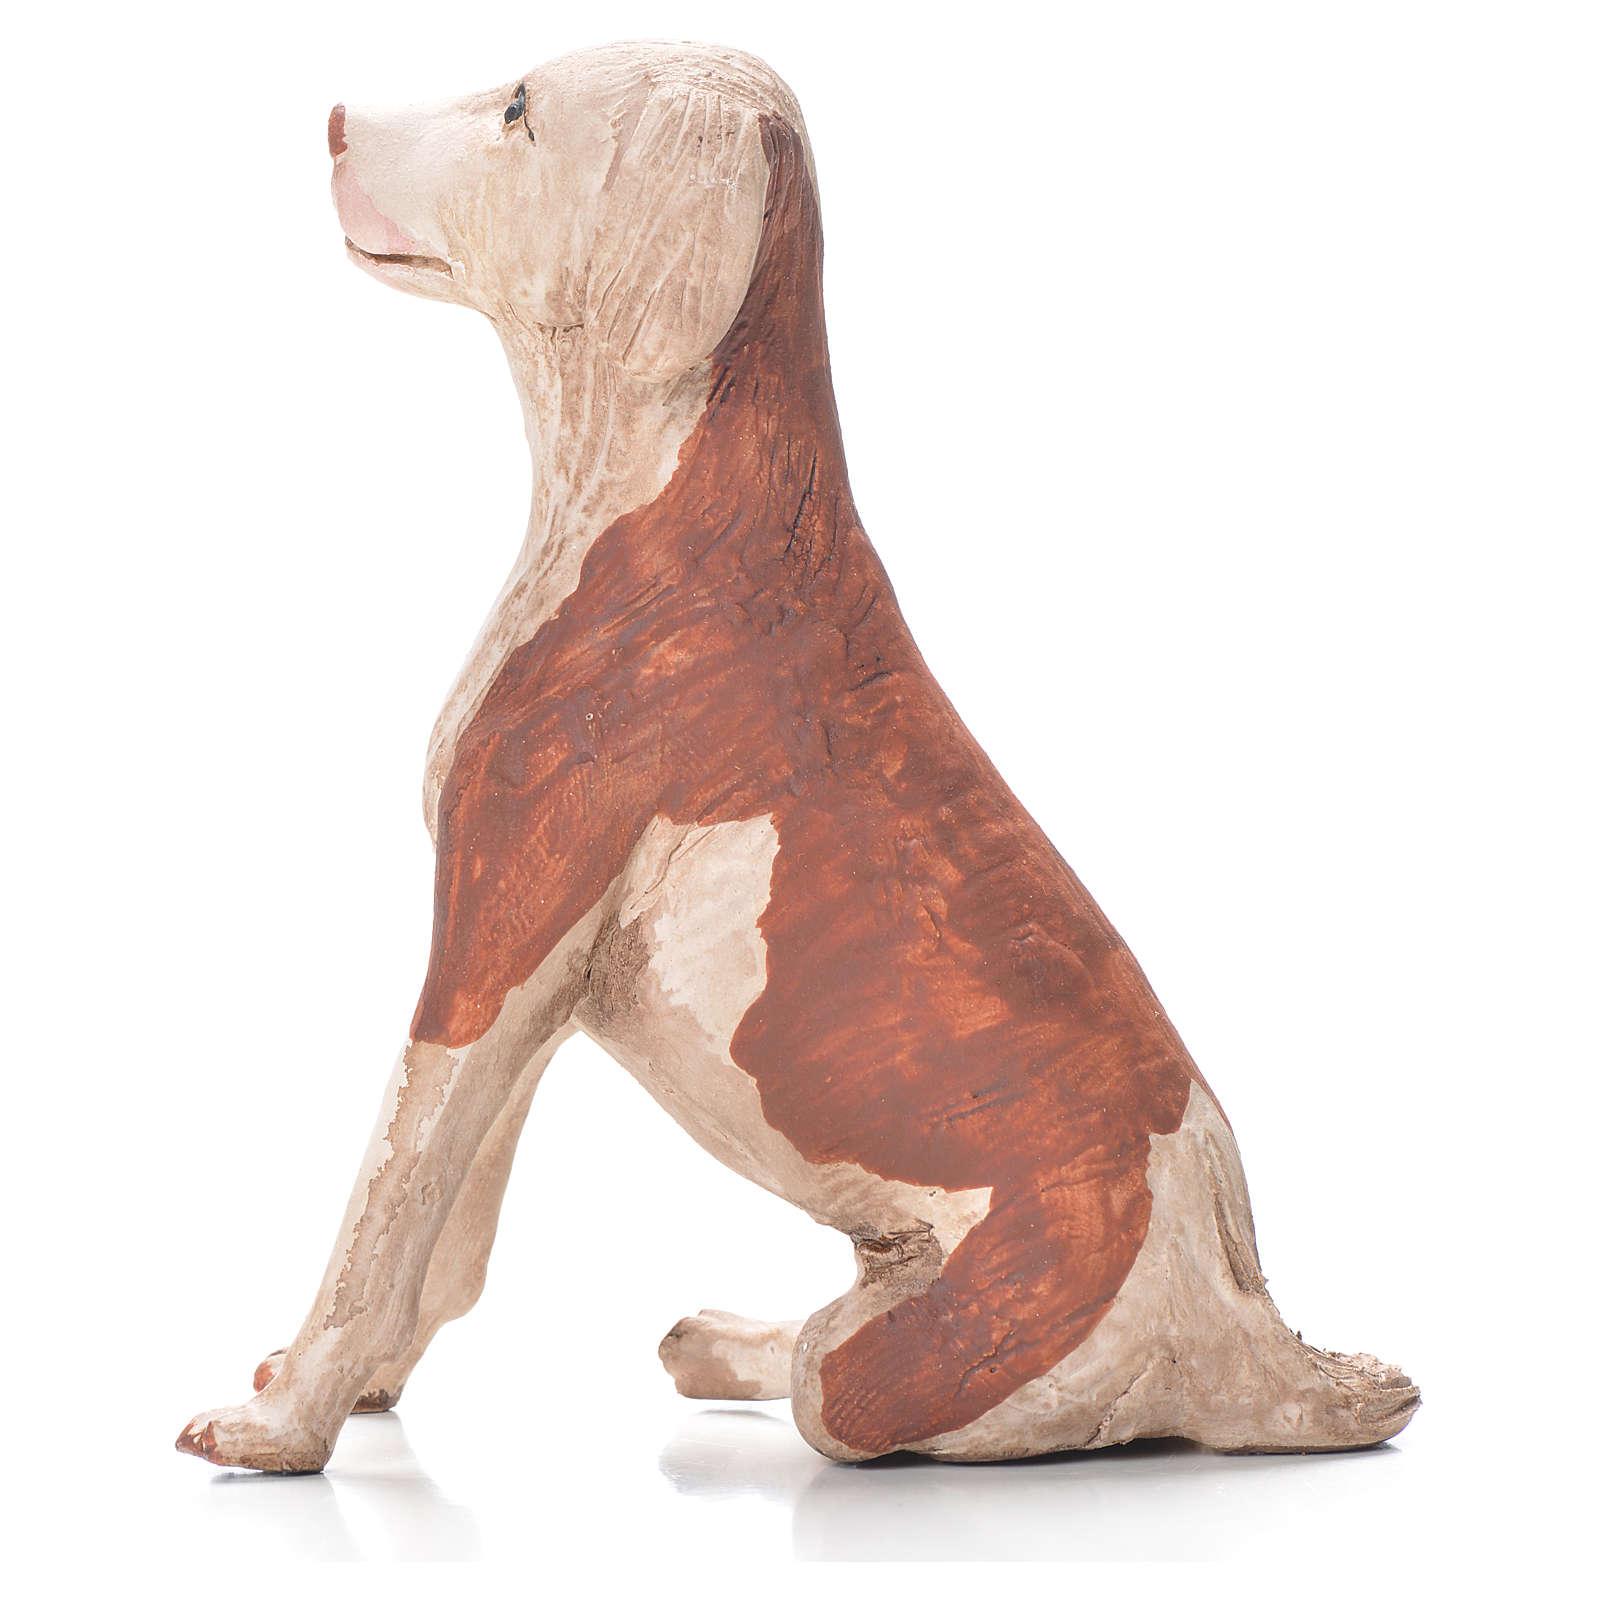 Cane seduto 24 cm terracotta presepe Napoli 4